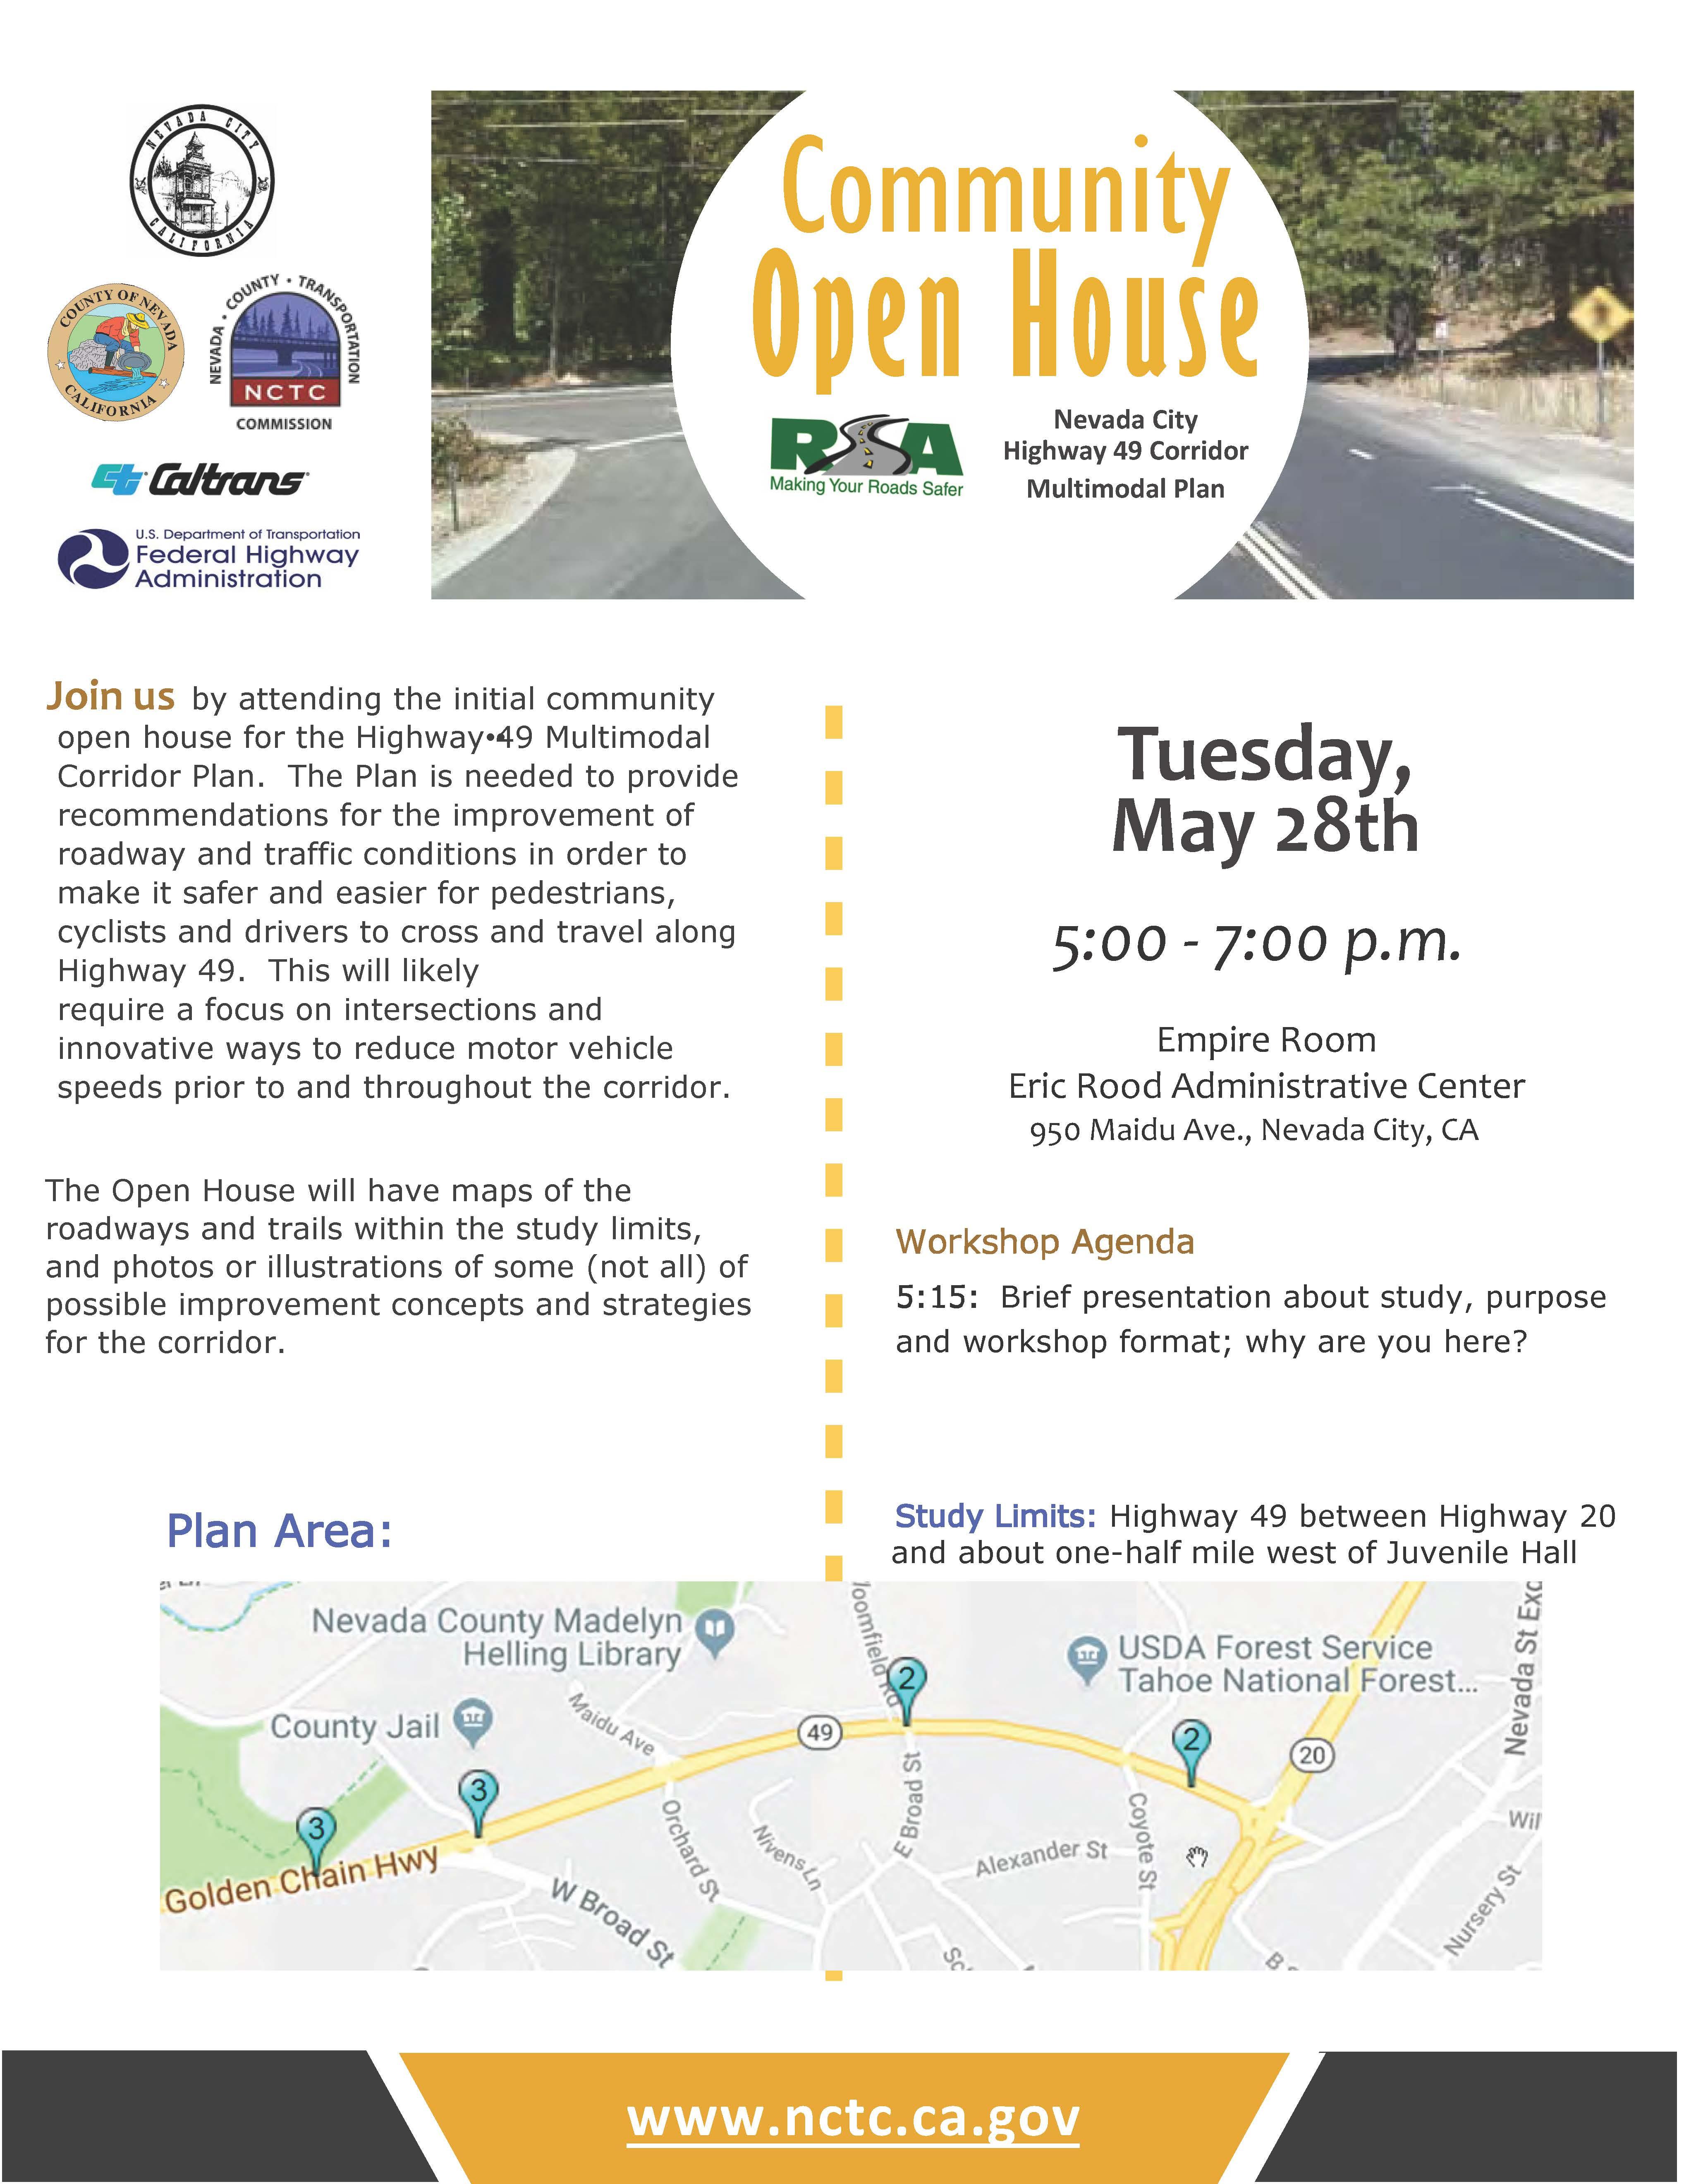 NCTC Open House presenting the SR 49 Nevada City Multimodal Corridor